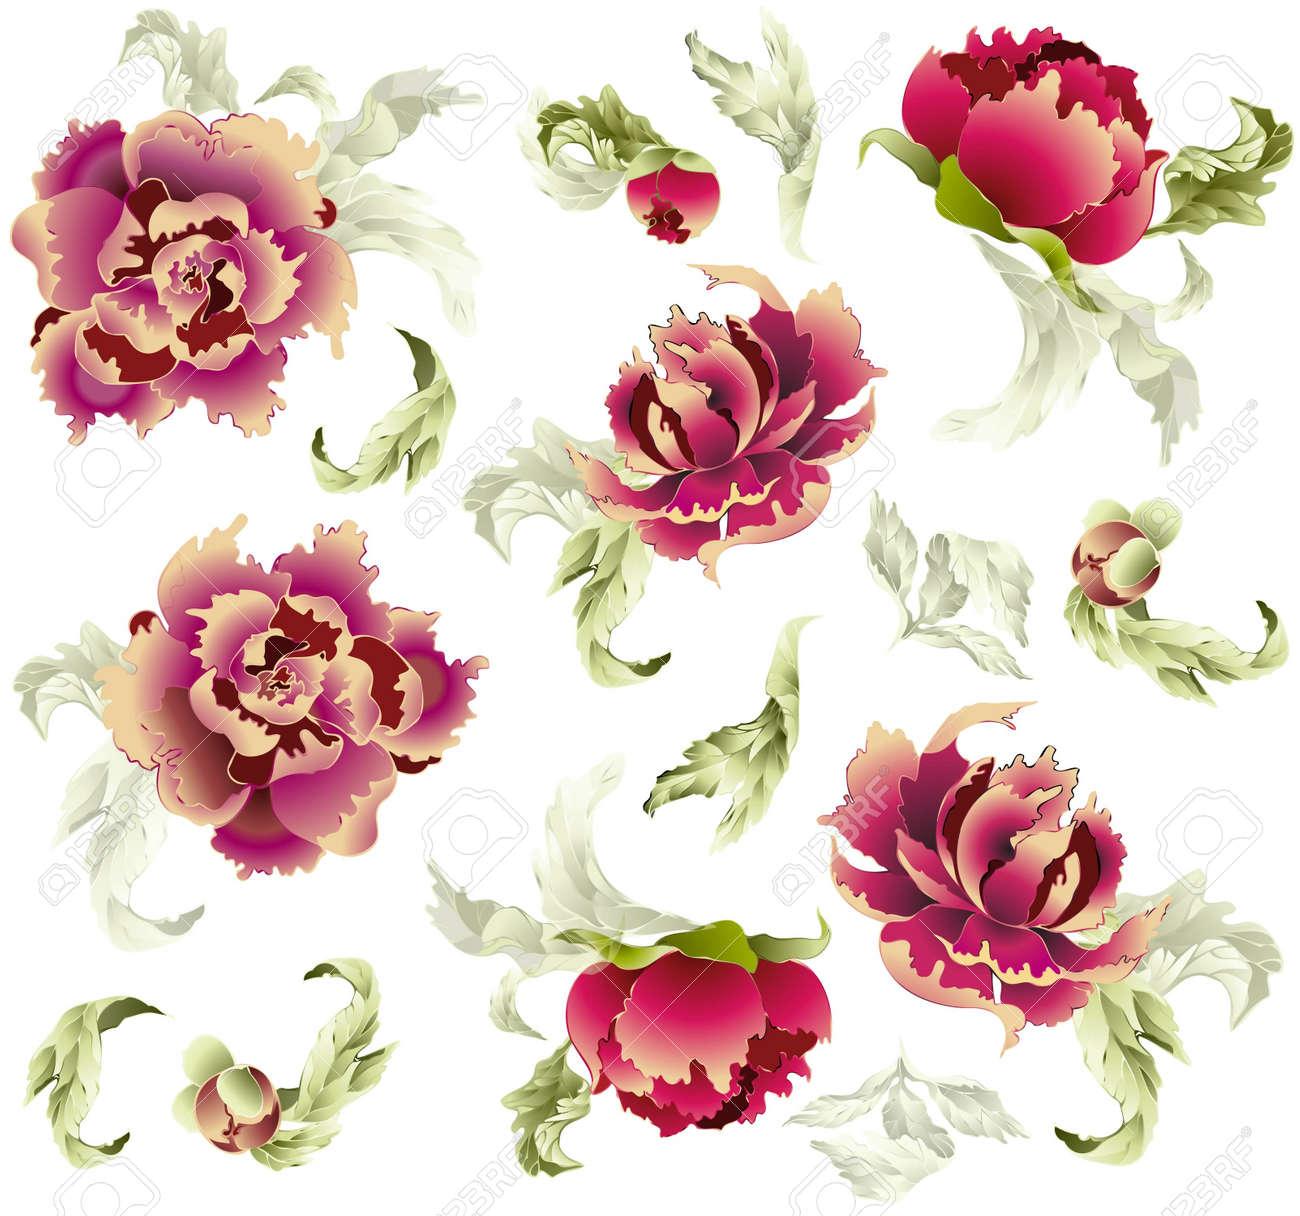 Fondo transparente de un adorno de flores, moda modern wallpaper o textil Foto de archivo